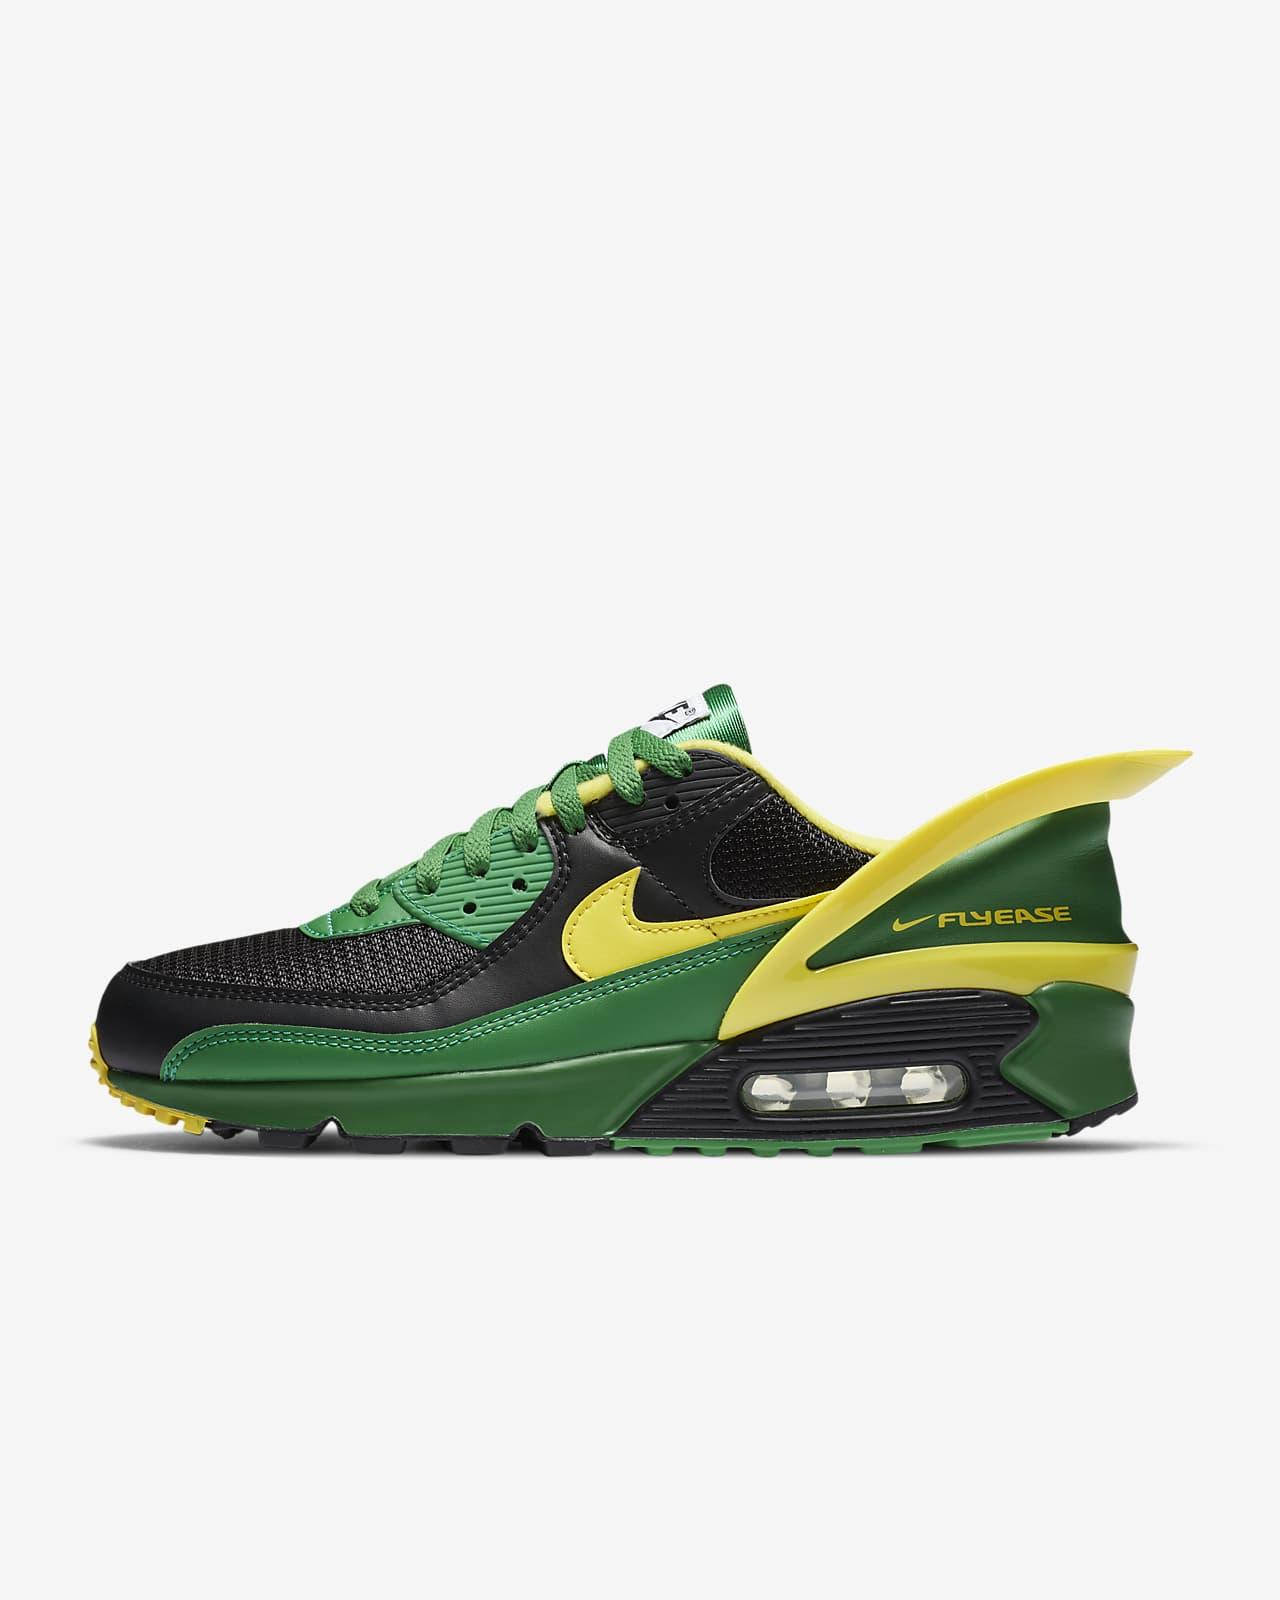 Chaussure Nike Air Max 90 FlyEase